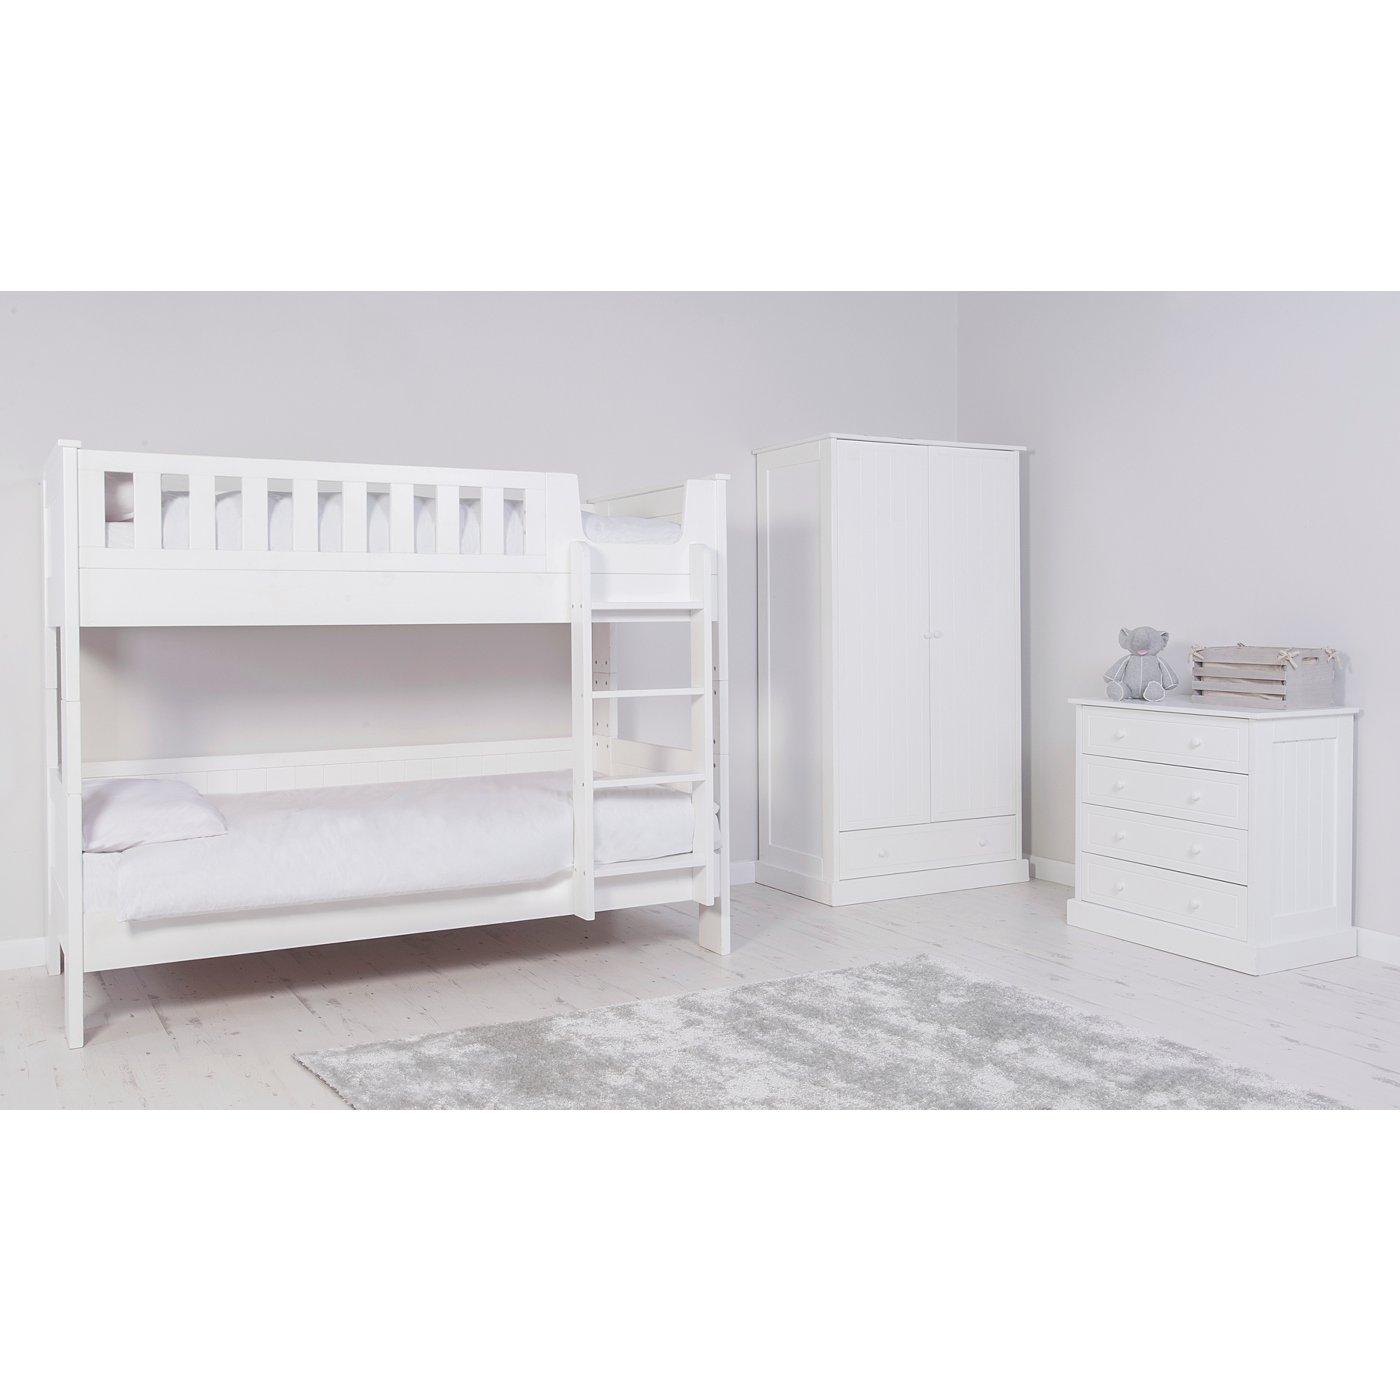 Finley Kids Furniture Range - White | View All | George at ASDA